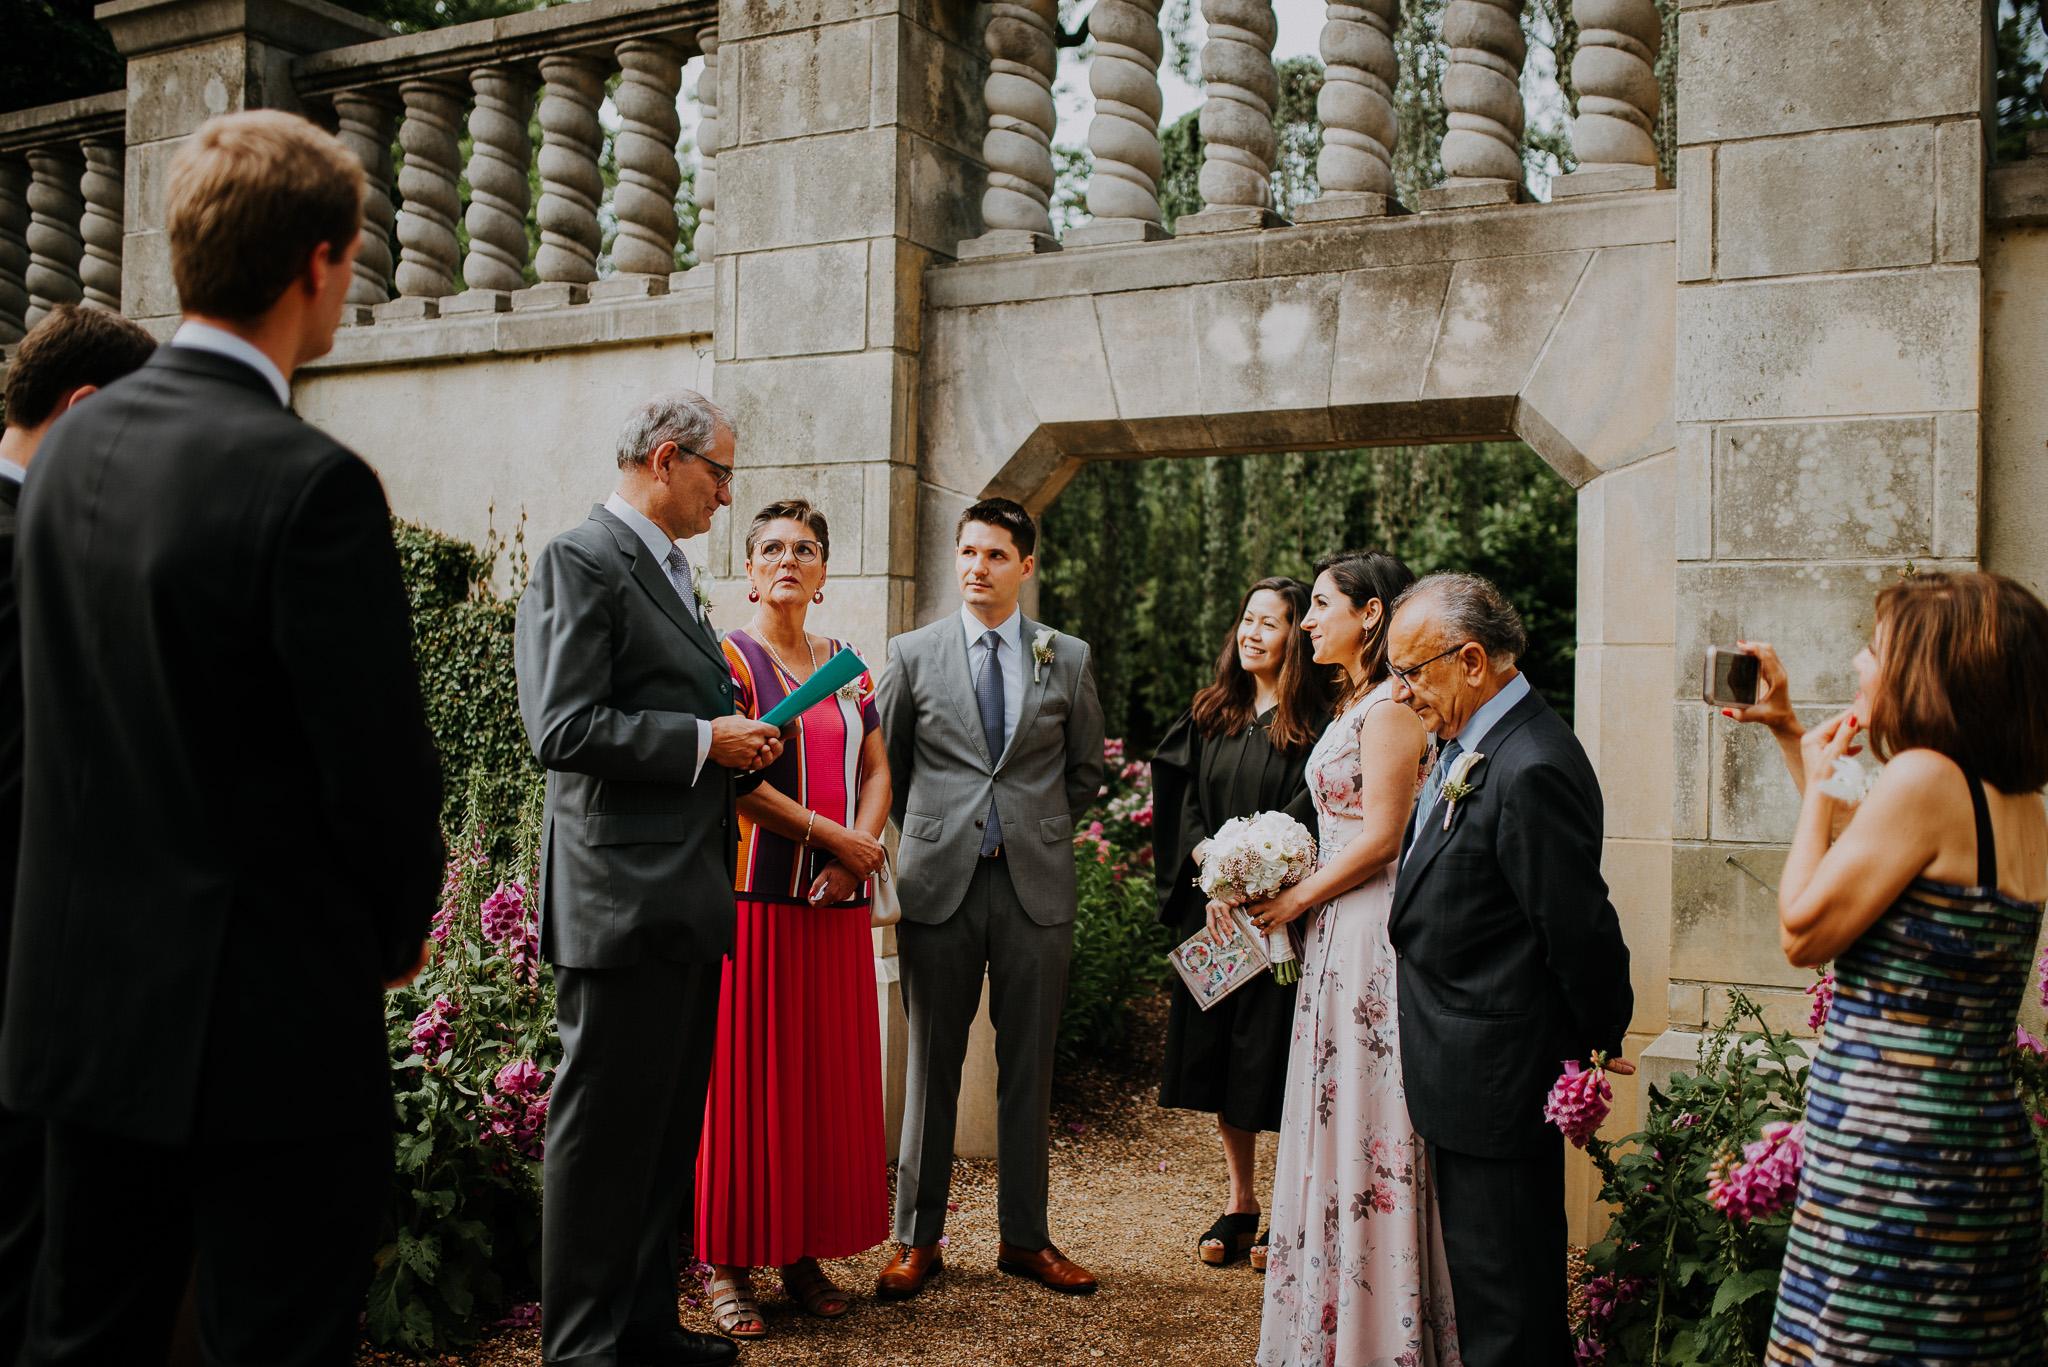 Dallas-fort-worth-wedding-photographer-dallas-arboretum-intimate-wedding-dallas-texas-15